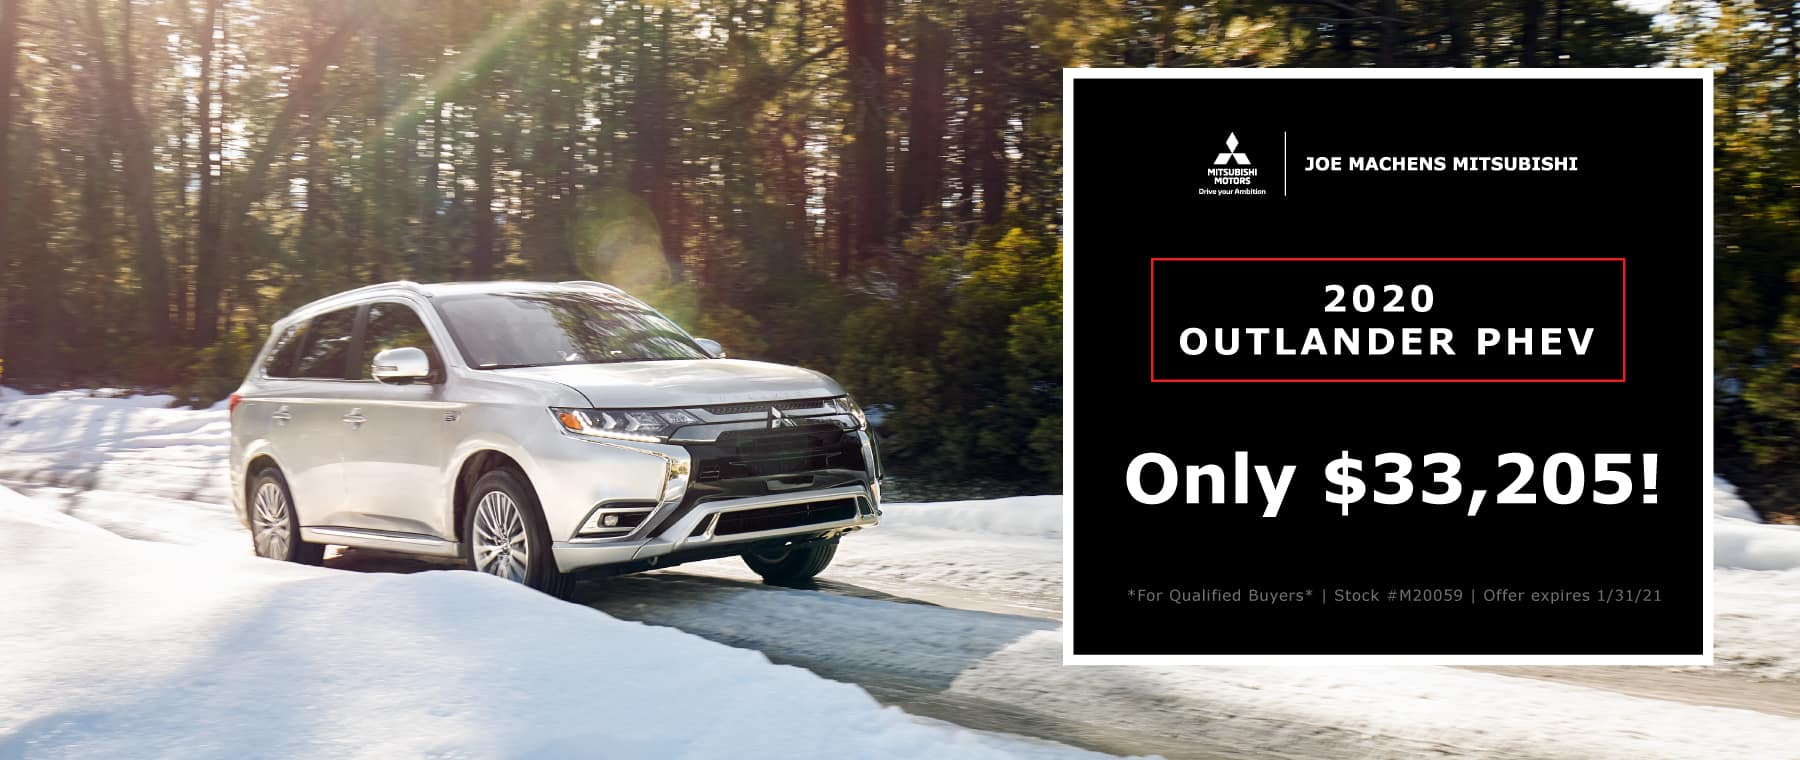 Machens-Mitsubishi-Incentives-01-21_20-OutlanderPHEV-Slider